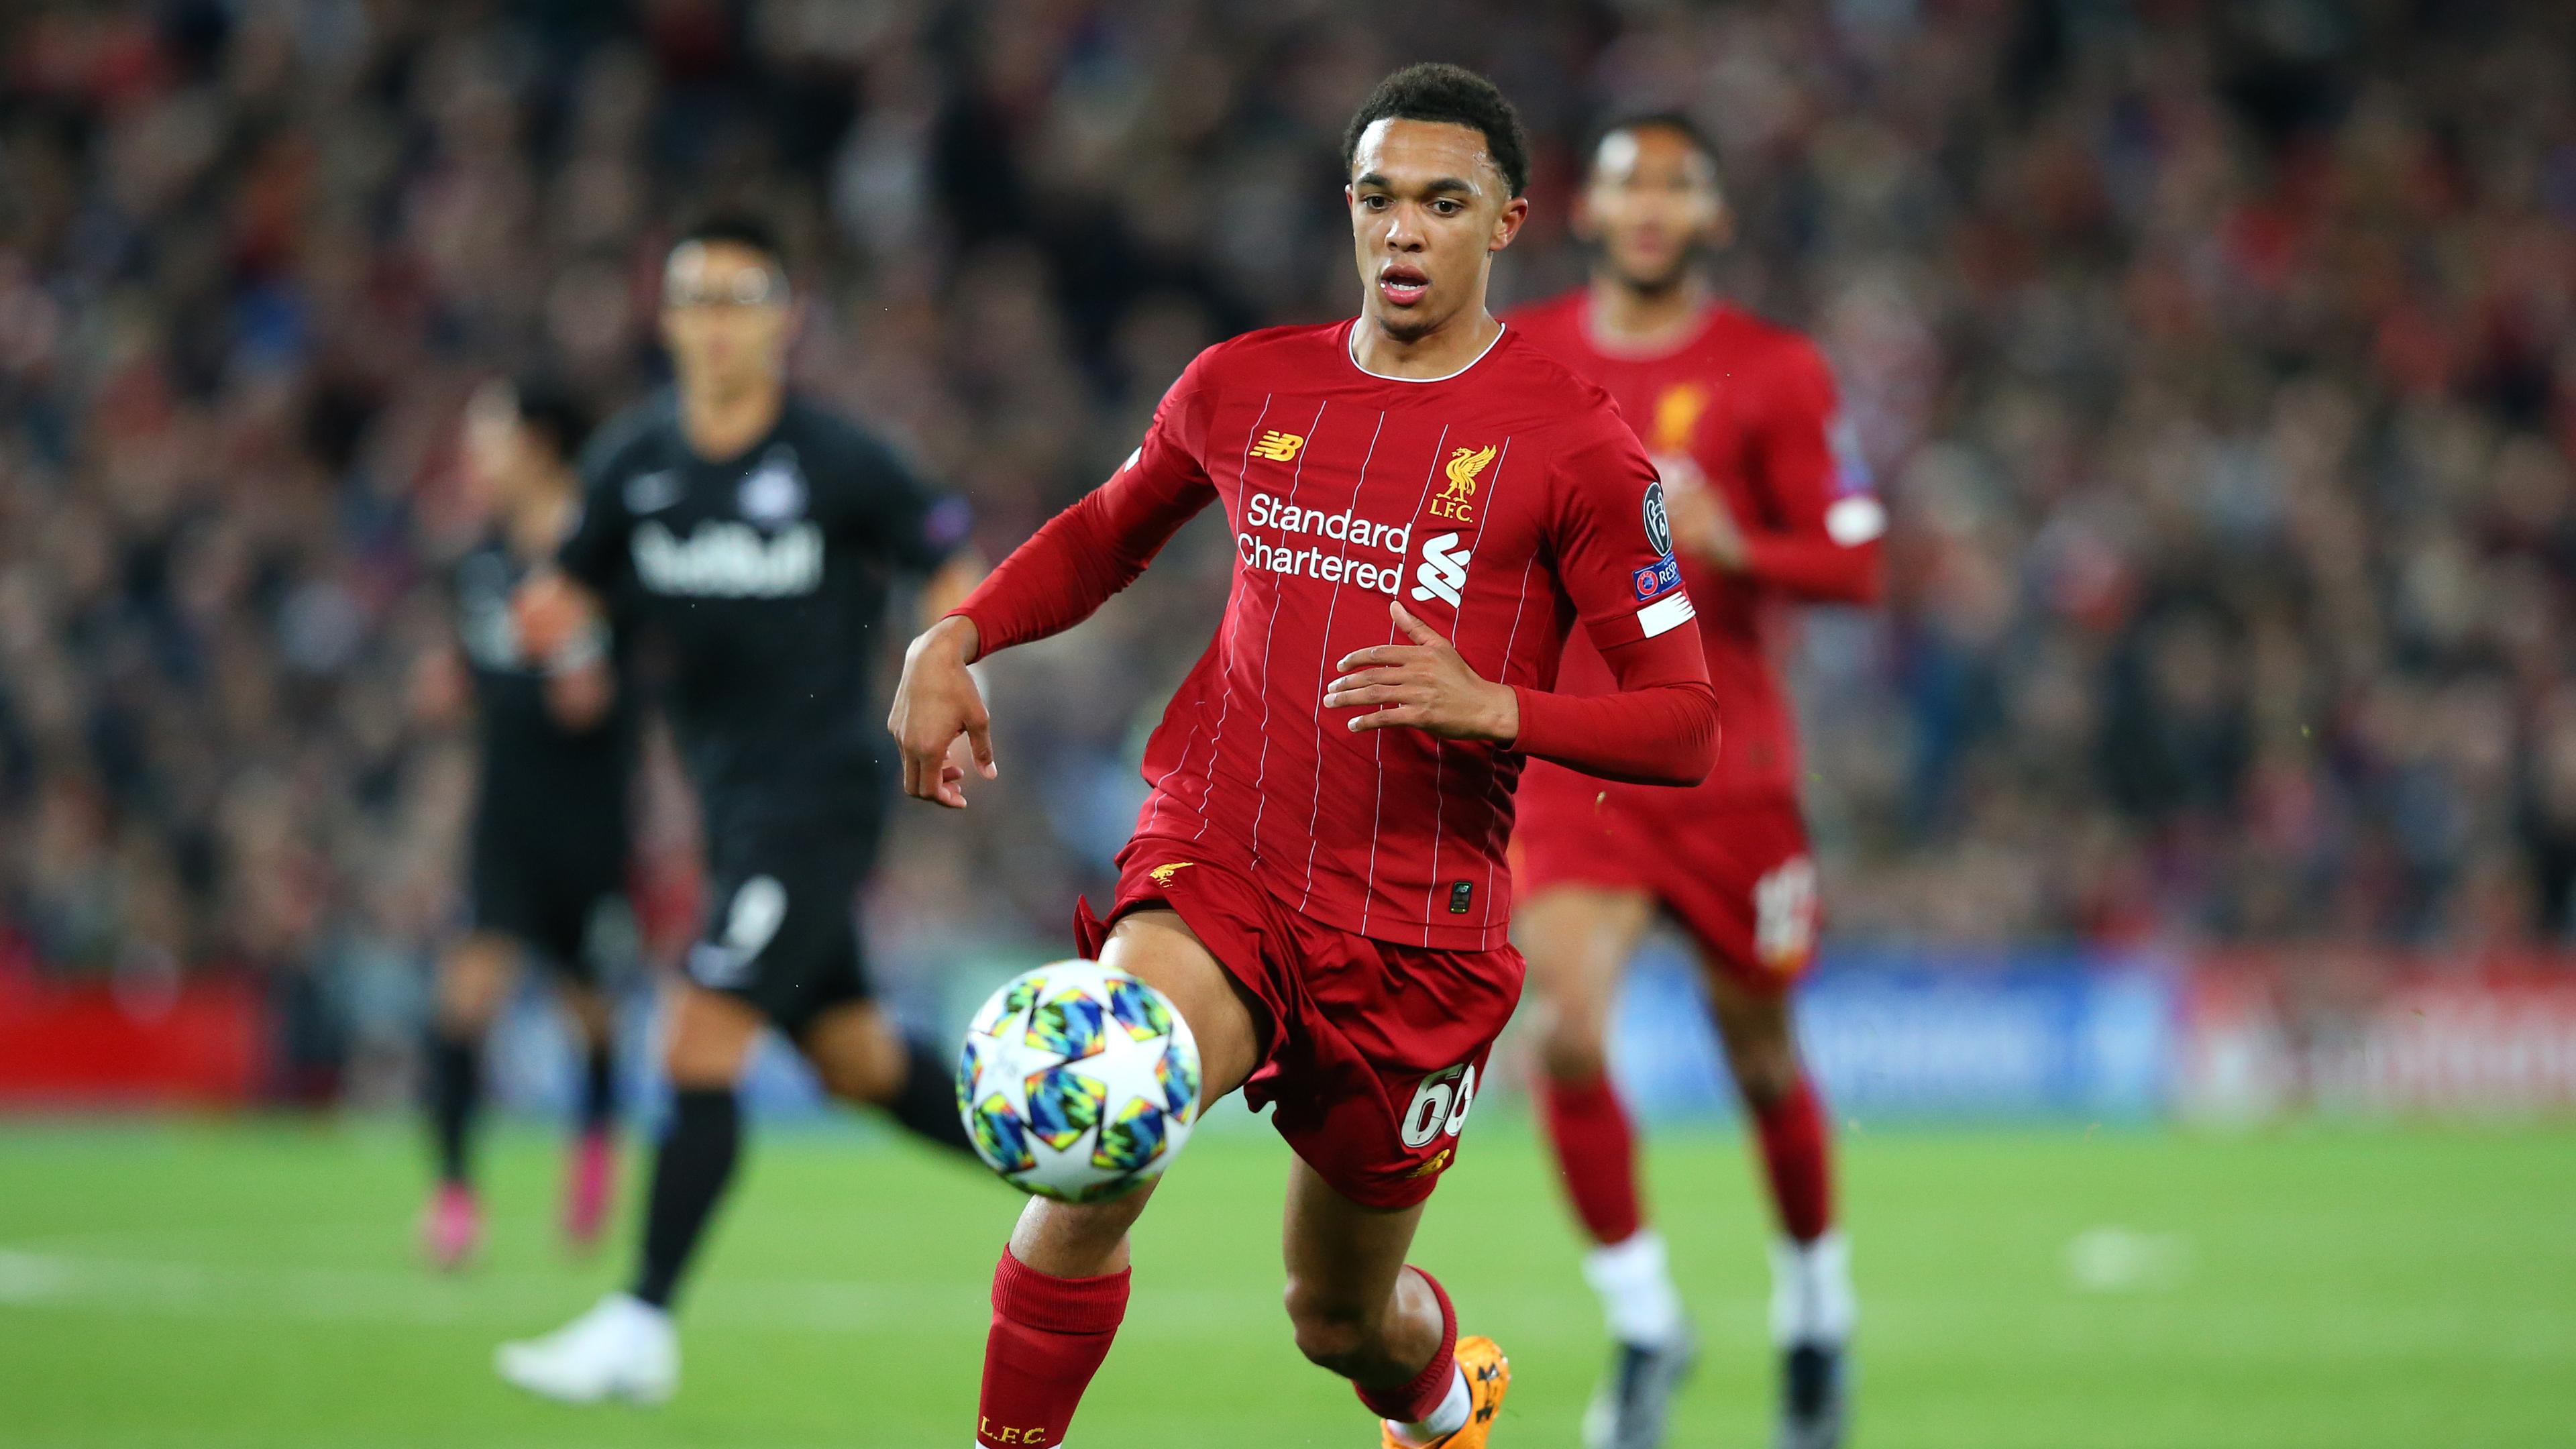 Liverpool : Trent Alexander-Arnold remercie chaleureusement Jürgen Klopp